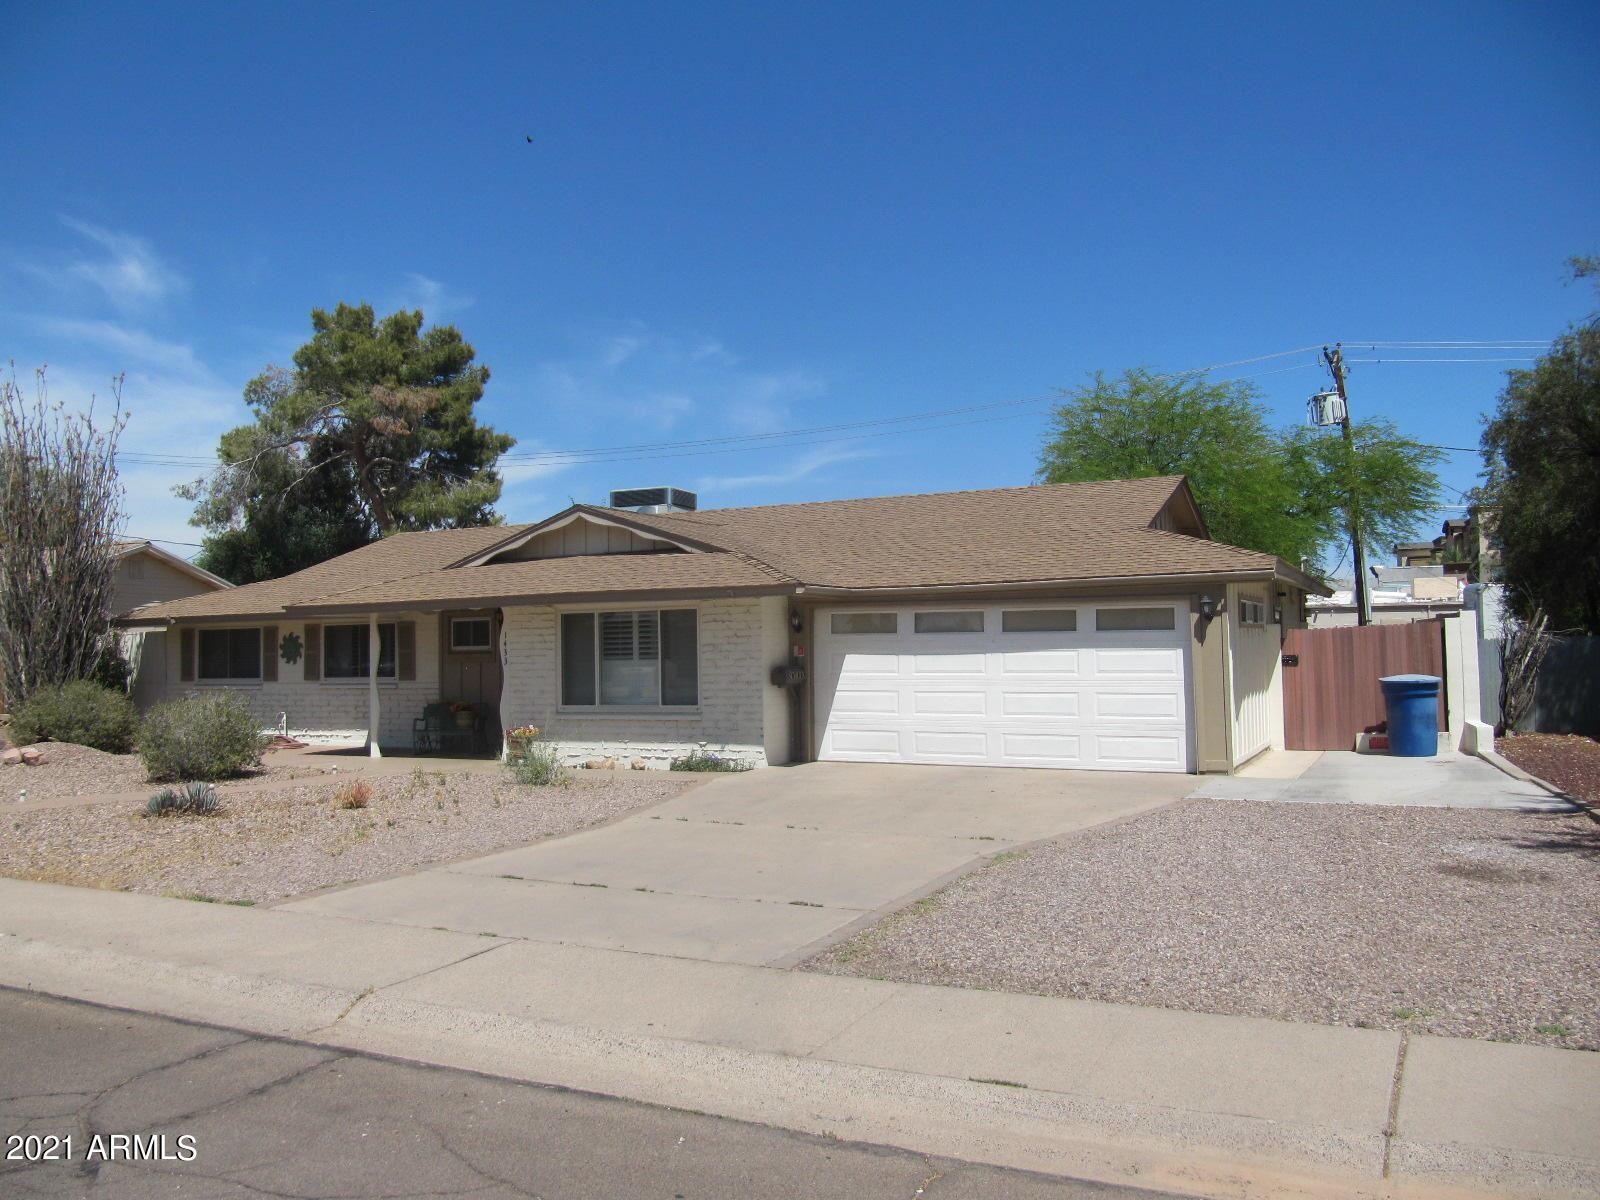 Photo of 1433 N Sunset Drive, Tempe, AZ 85281 (MLS # 6232249)